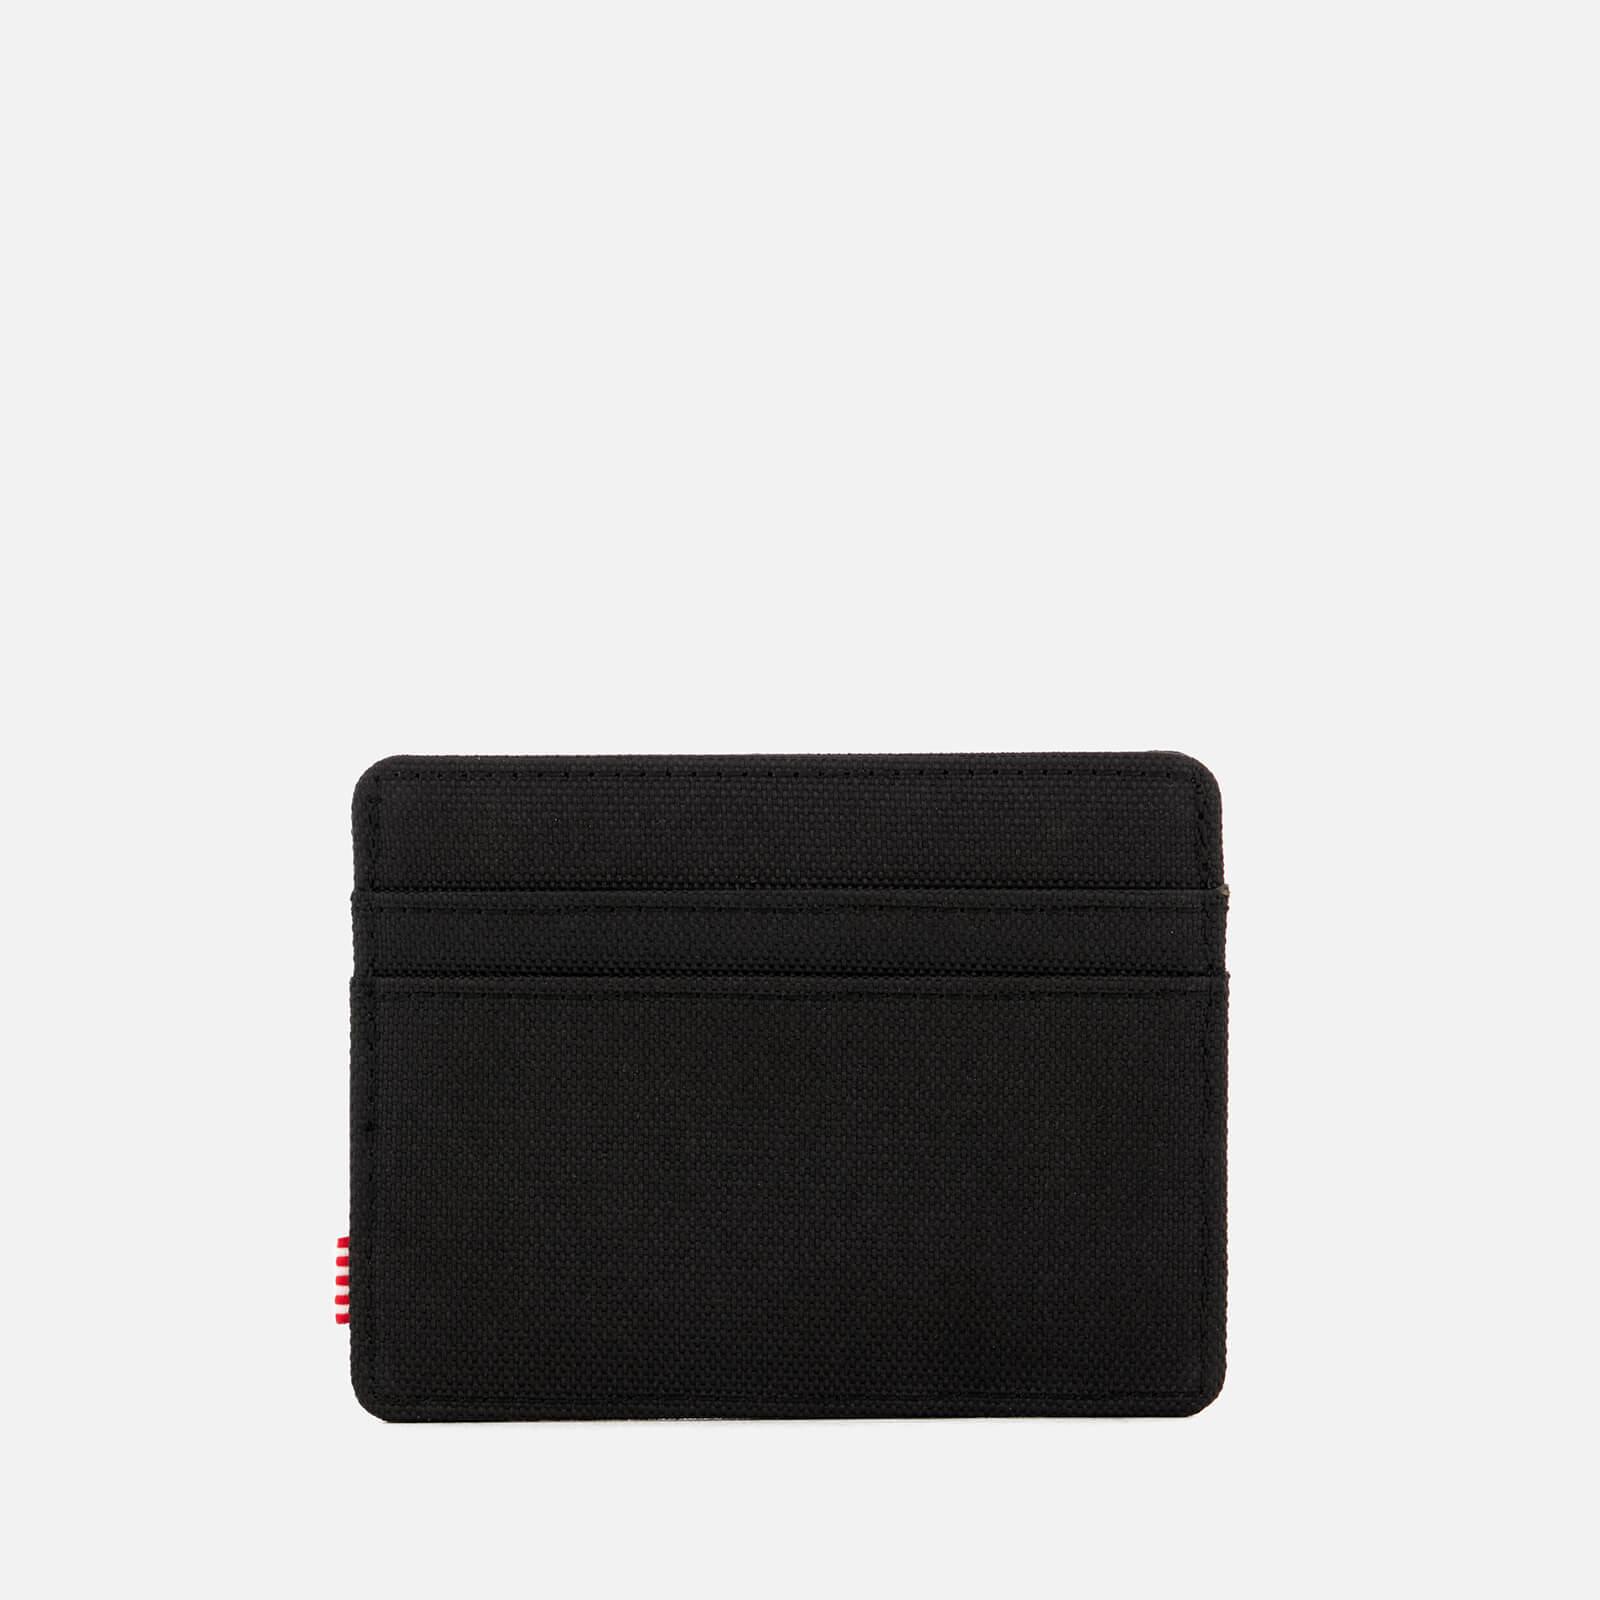 Herschel Supply Co. Men's Charlie Card Holder - Black